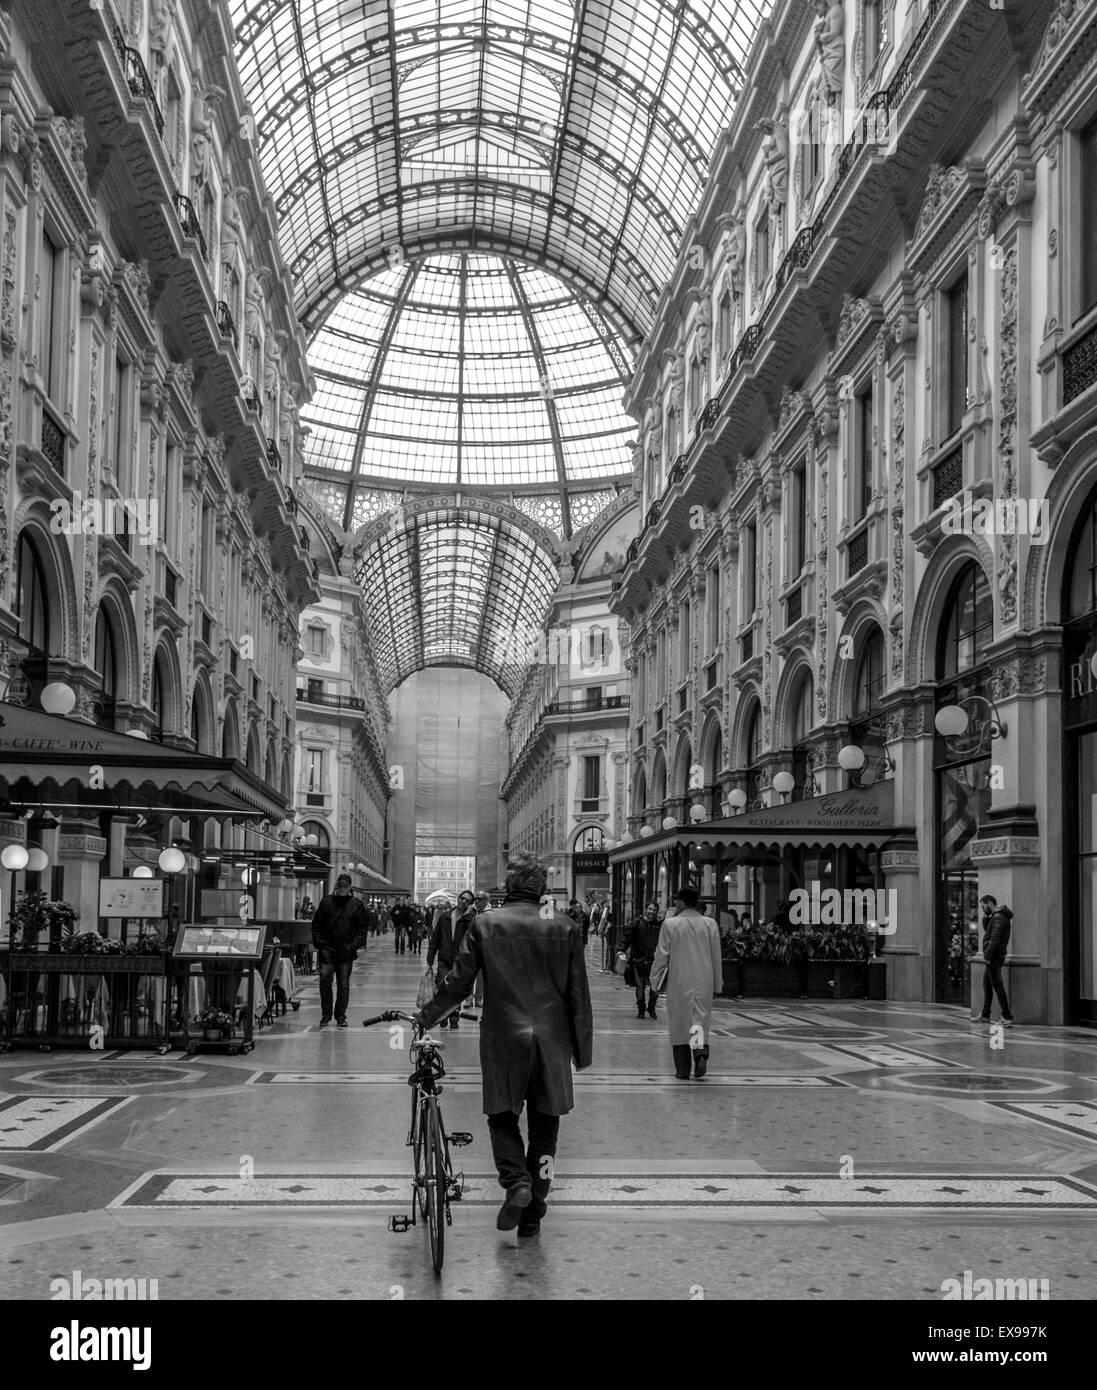 Push bike through the mall - Stock Image